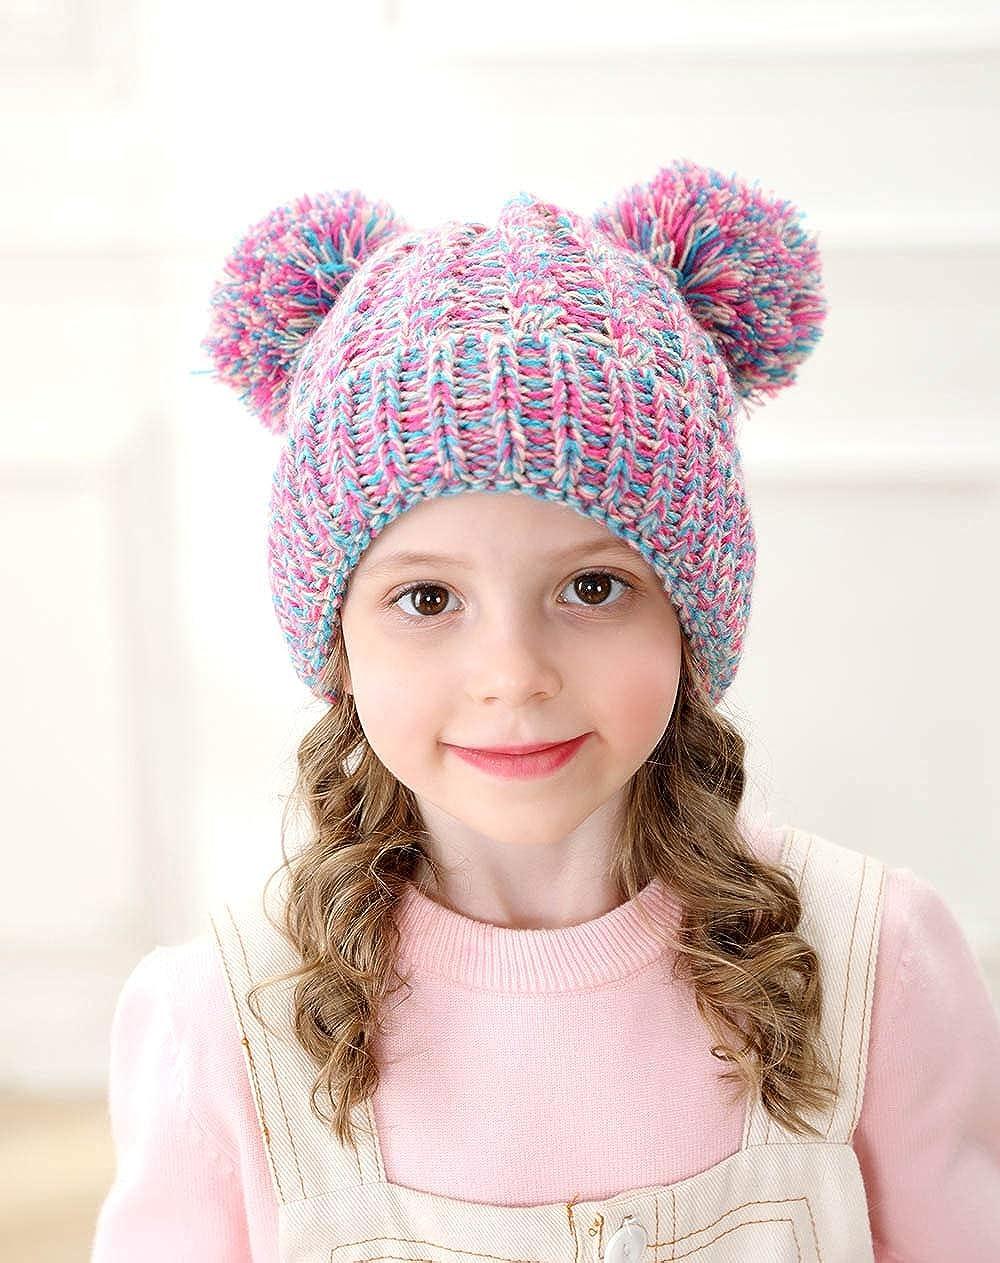 Flower Decal Crochet Beanie with Ear Flaps Little Girl Birthday